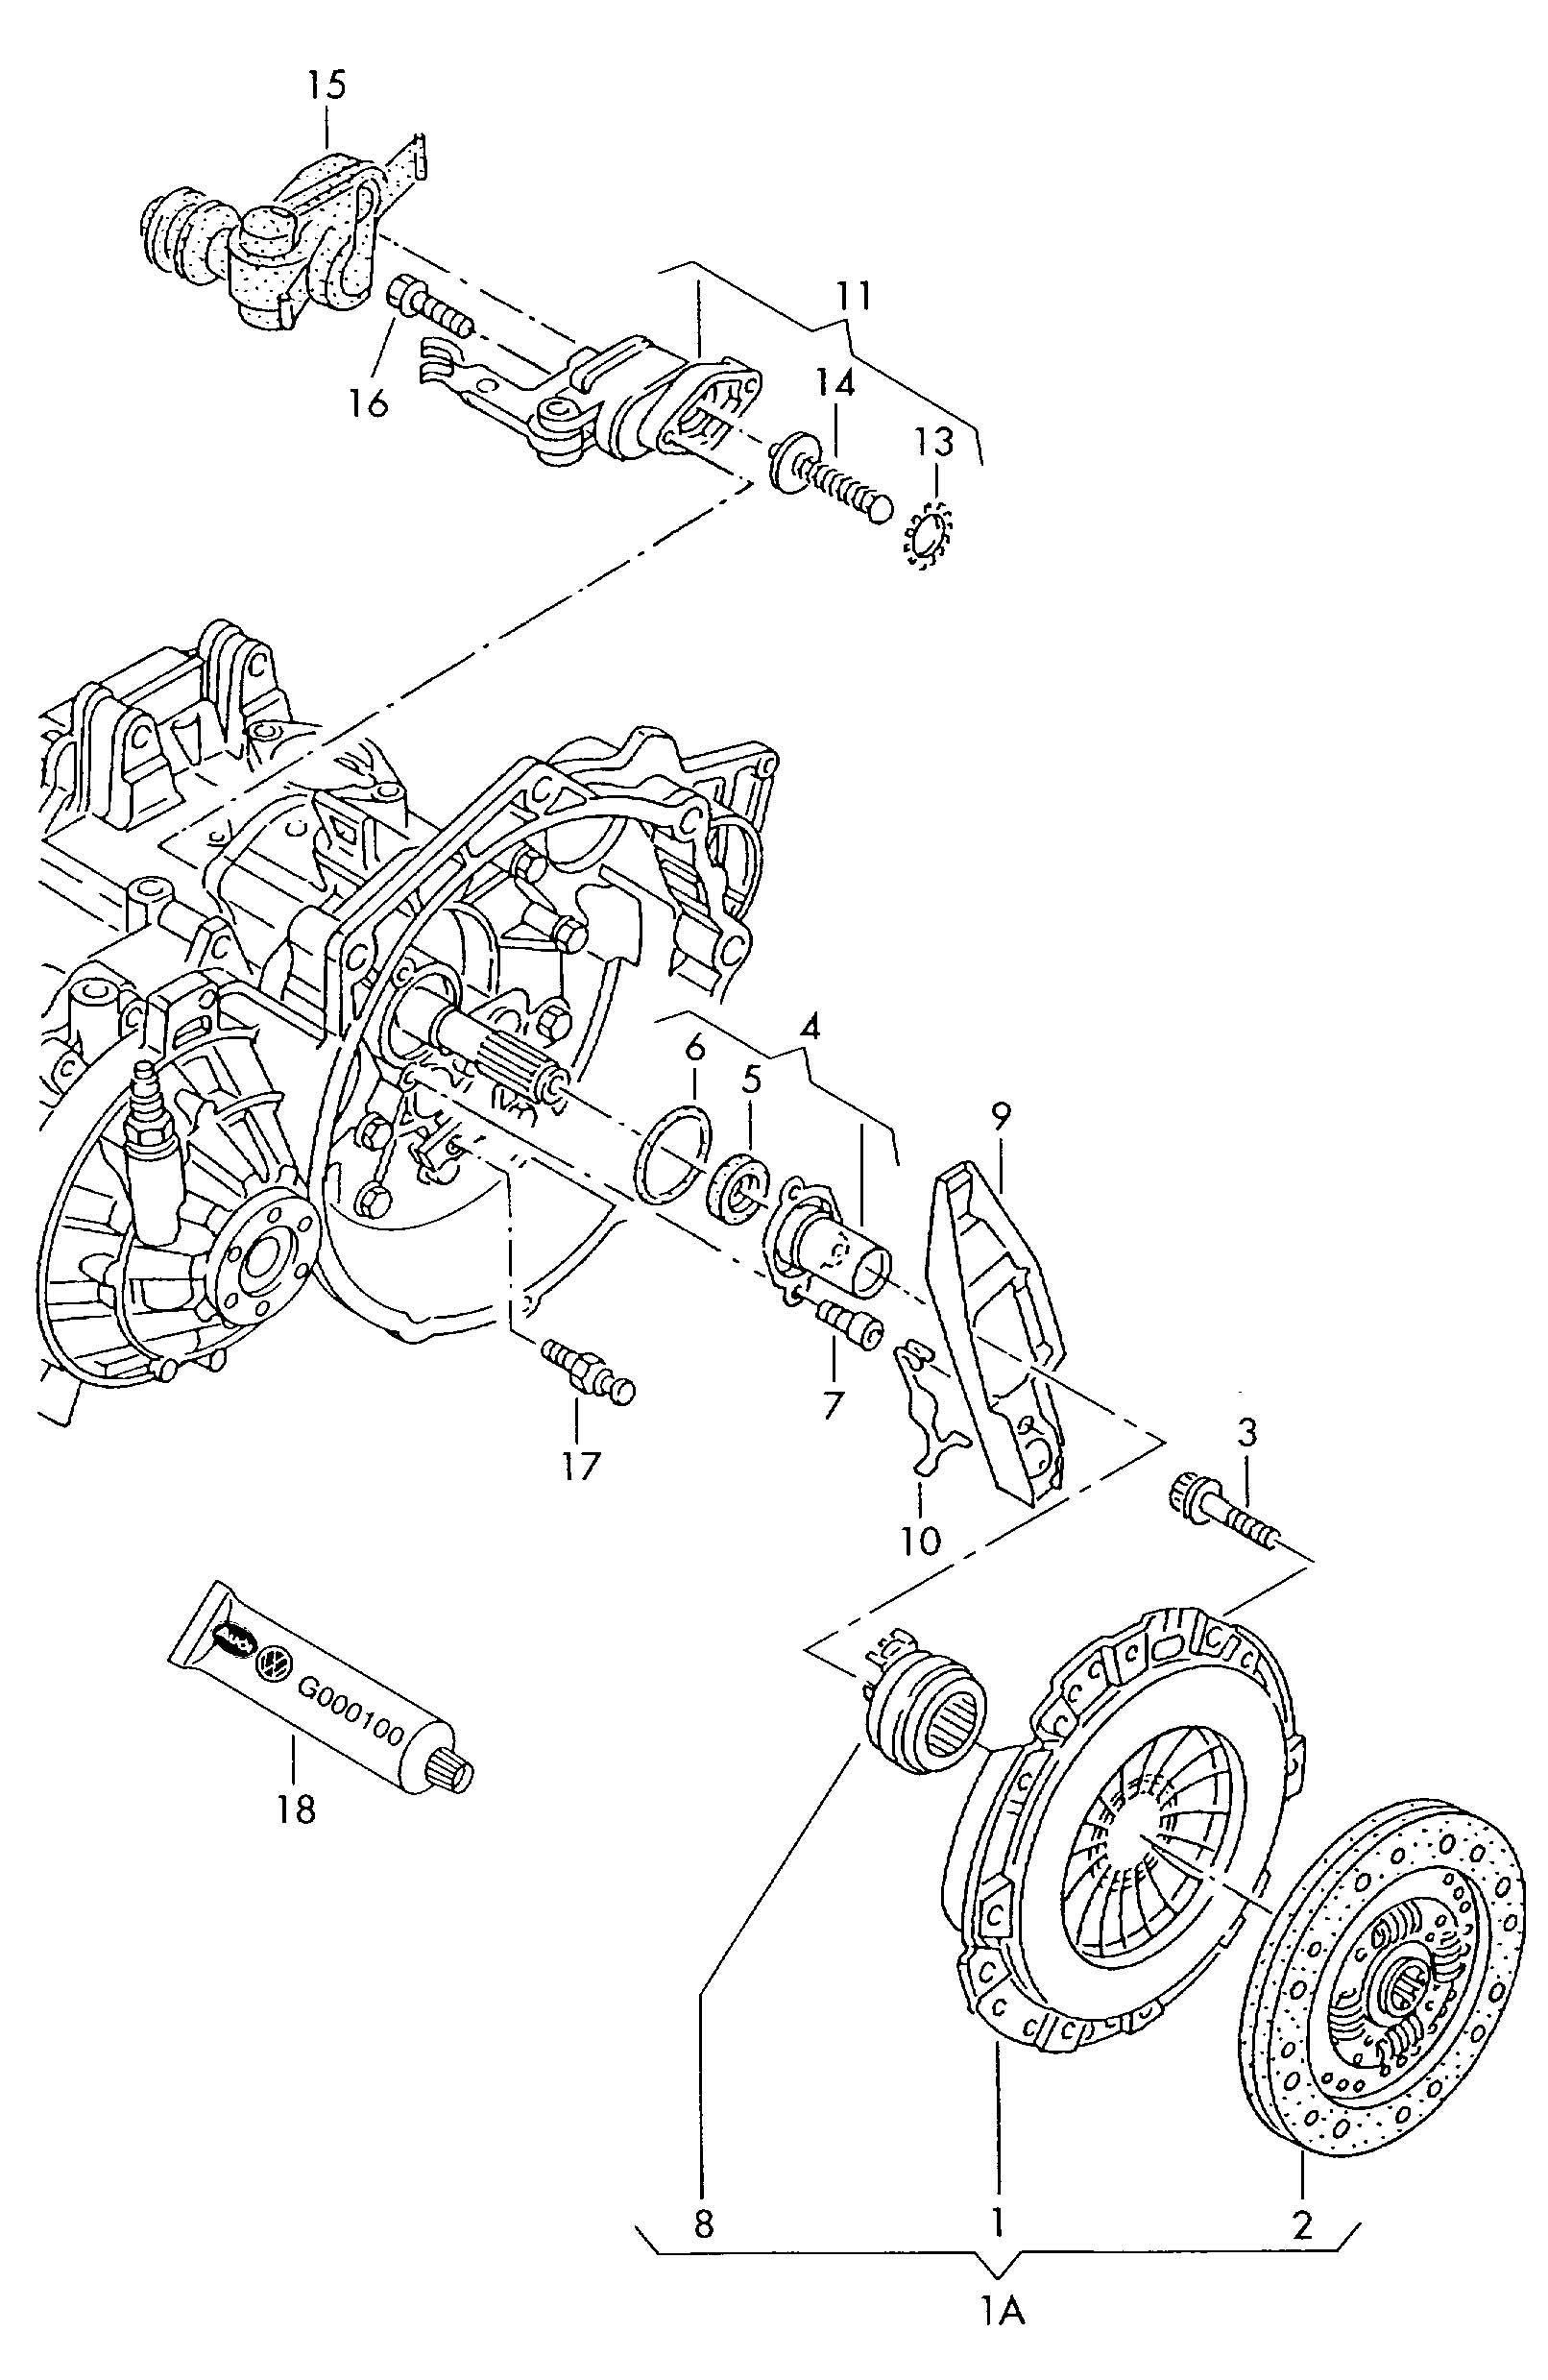 Volkswagen Eurovan Bracket For Mechanical Clutch Operation